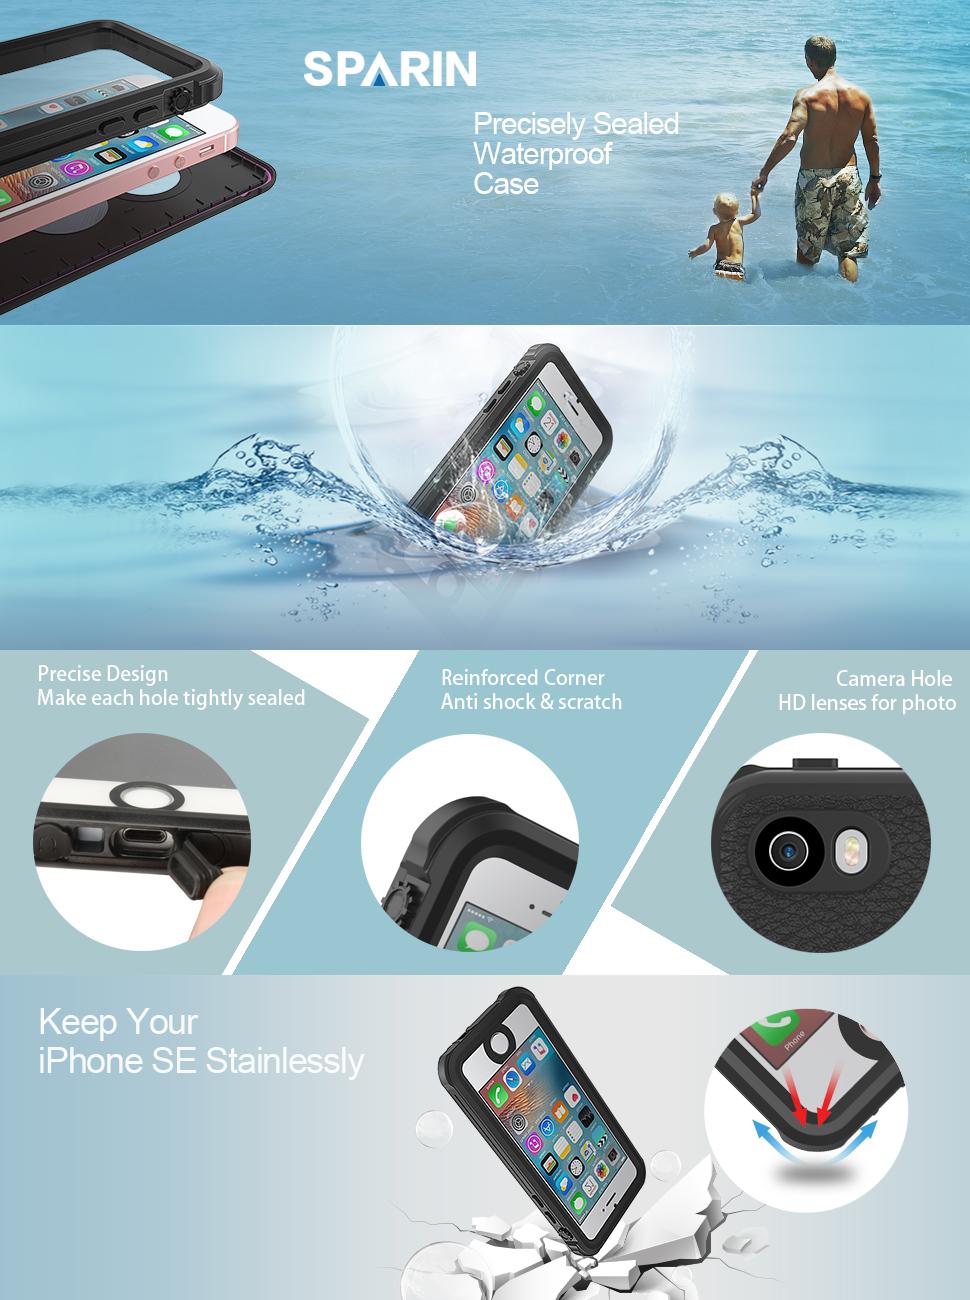 detailing 9ec34 740d2 Amazon.com: SPARIN iPhone SE Waterproof Case, iPhone 5 / 5S ...